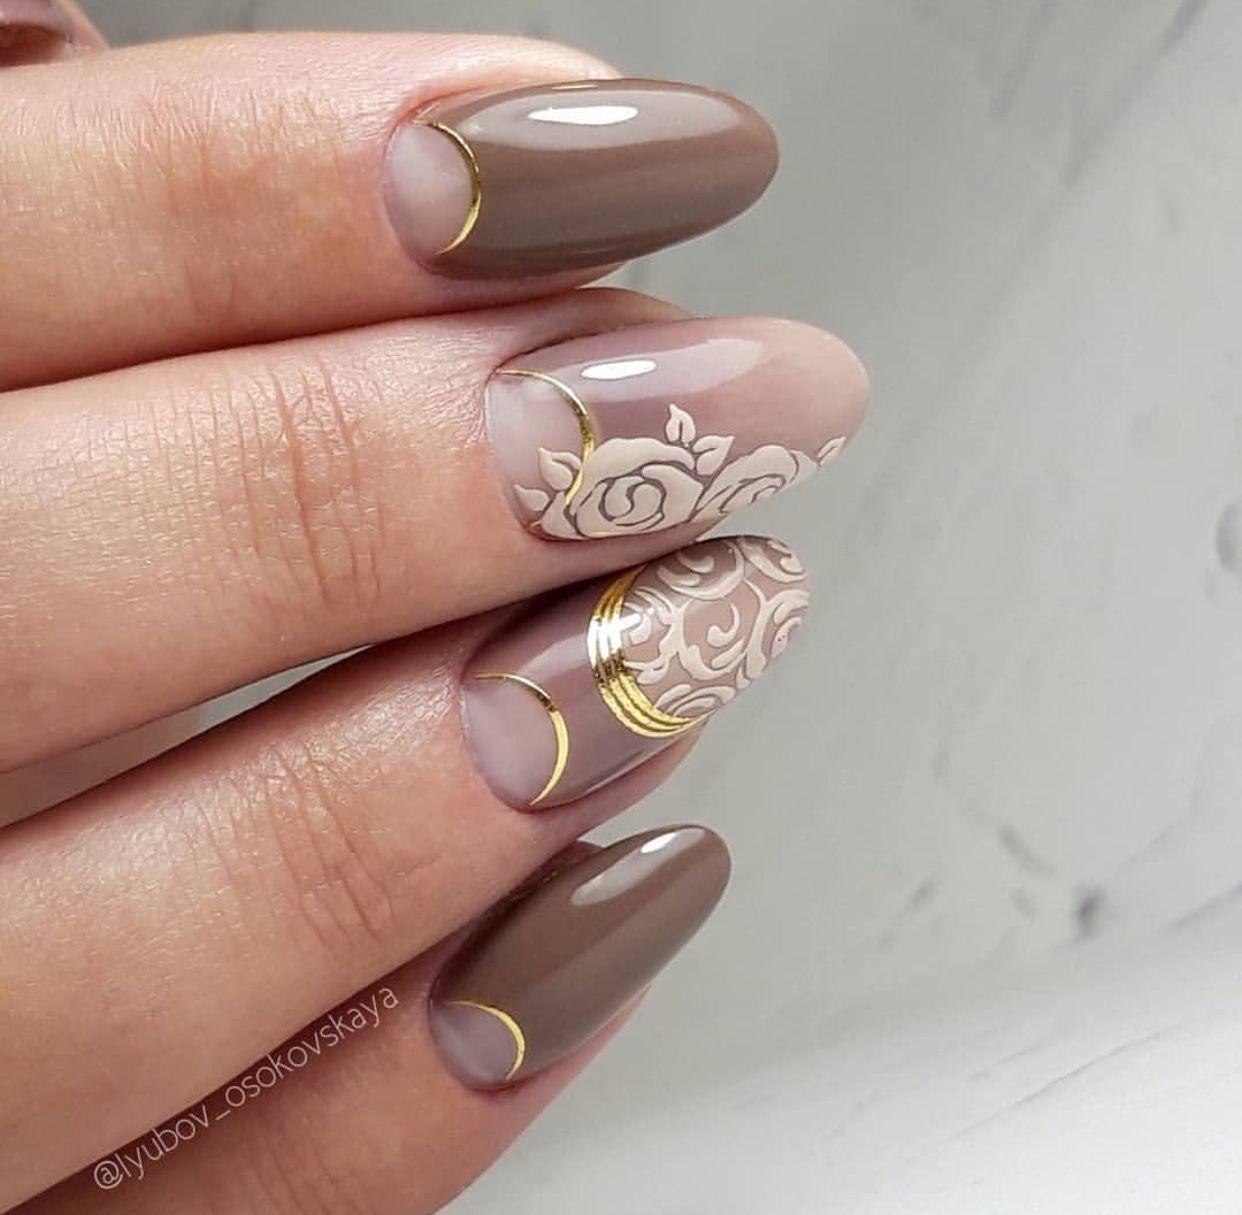 Екатерина мирошниченко дизайн ногтей фото новинки 2020